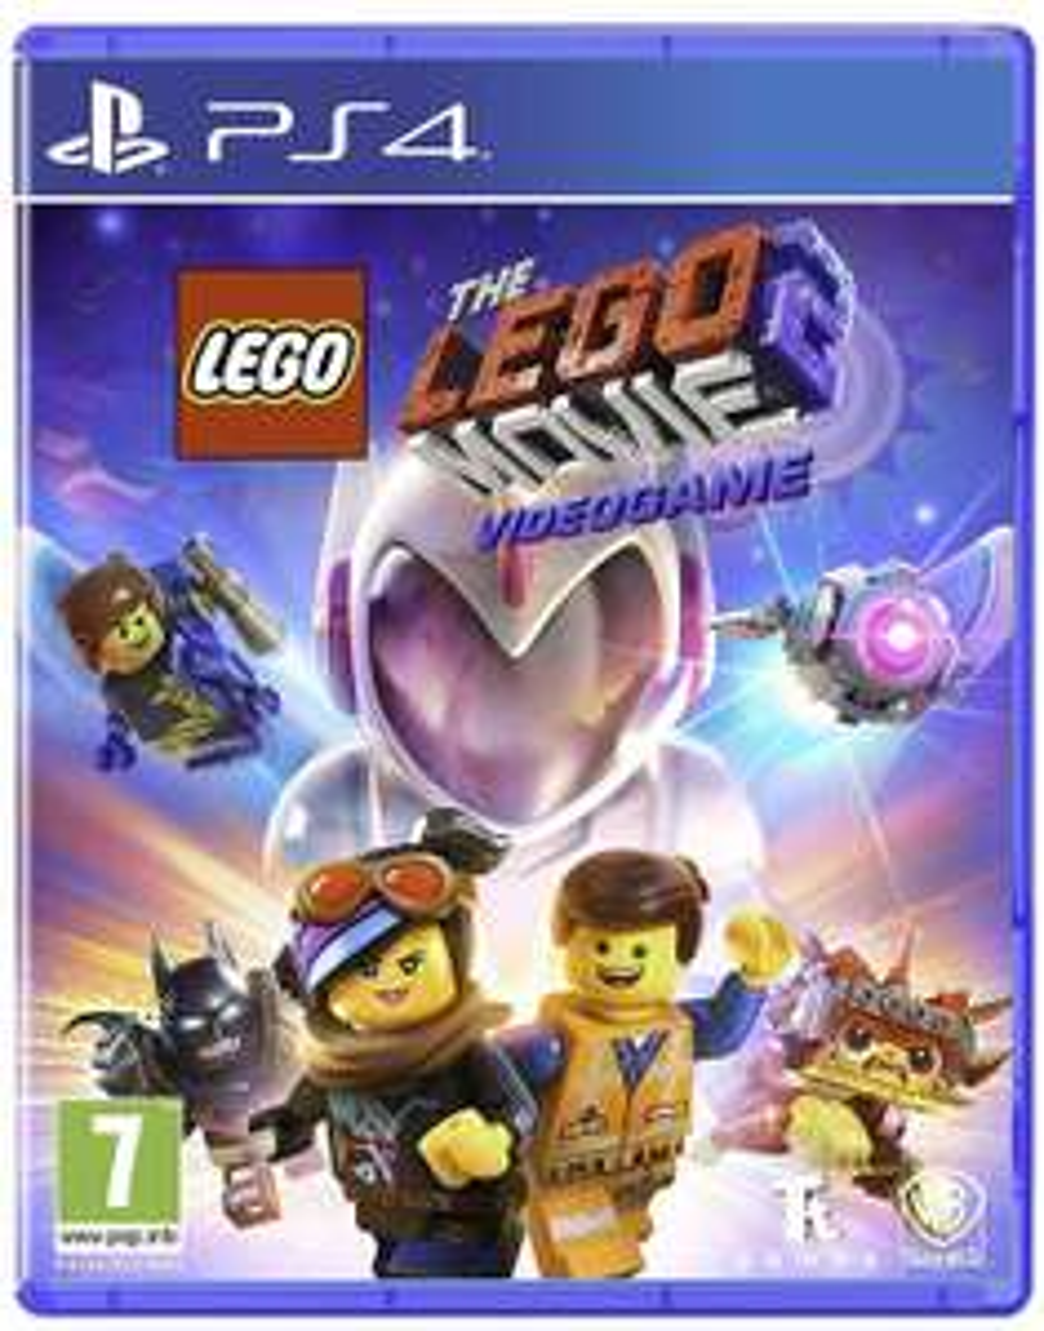 LEGO Movie 2: The Video Game (PS4) für 20,01€ (ShopTo)